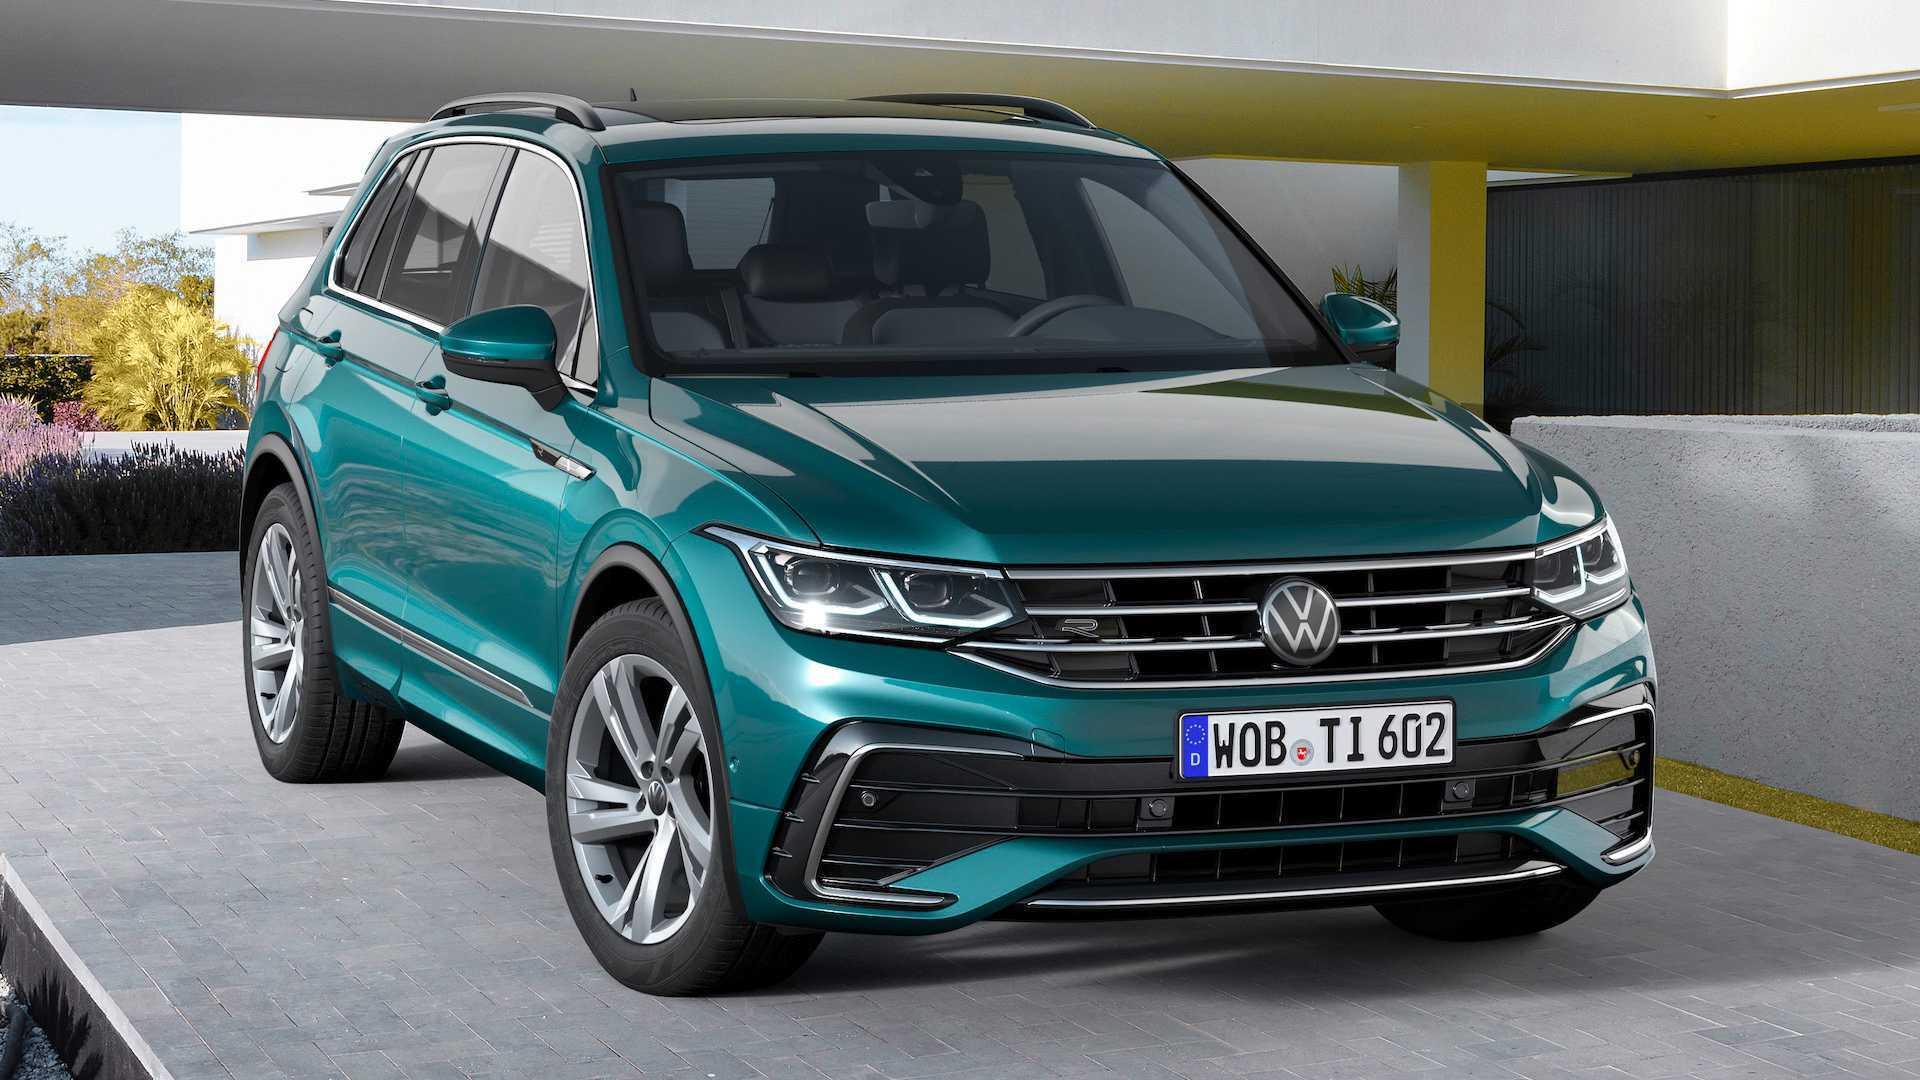 VW「ティグアン」改良新型の日本発売日はいつ?価格はいくら?